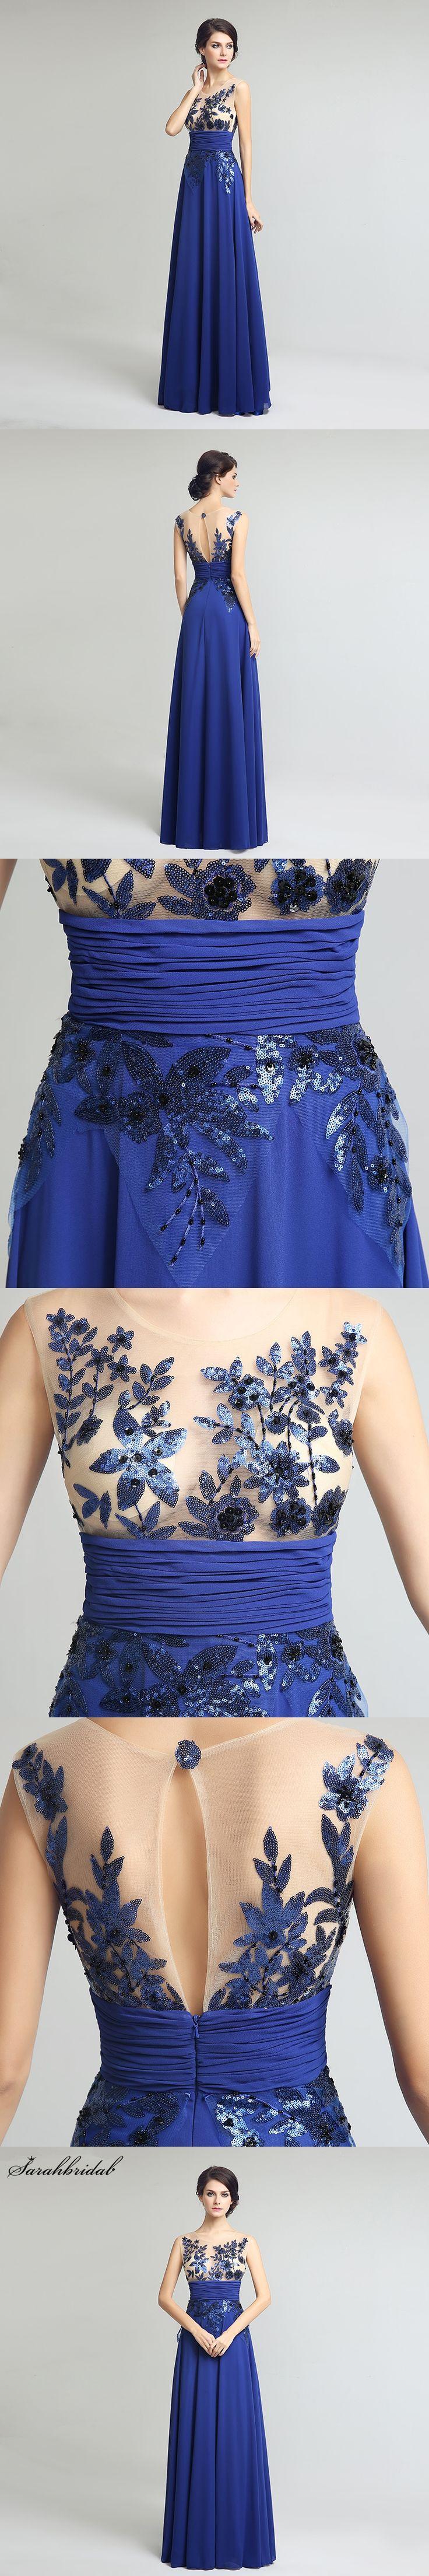 Elegant Illusion Prom Dresses Neck Sequined Applique Royal Blue Chiffon Dresses Vintage Graduation Party Dresses Robe SLD159